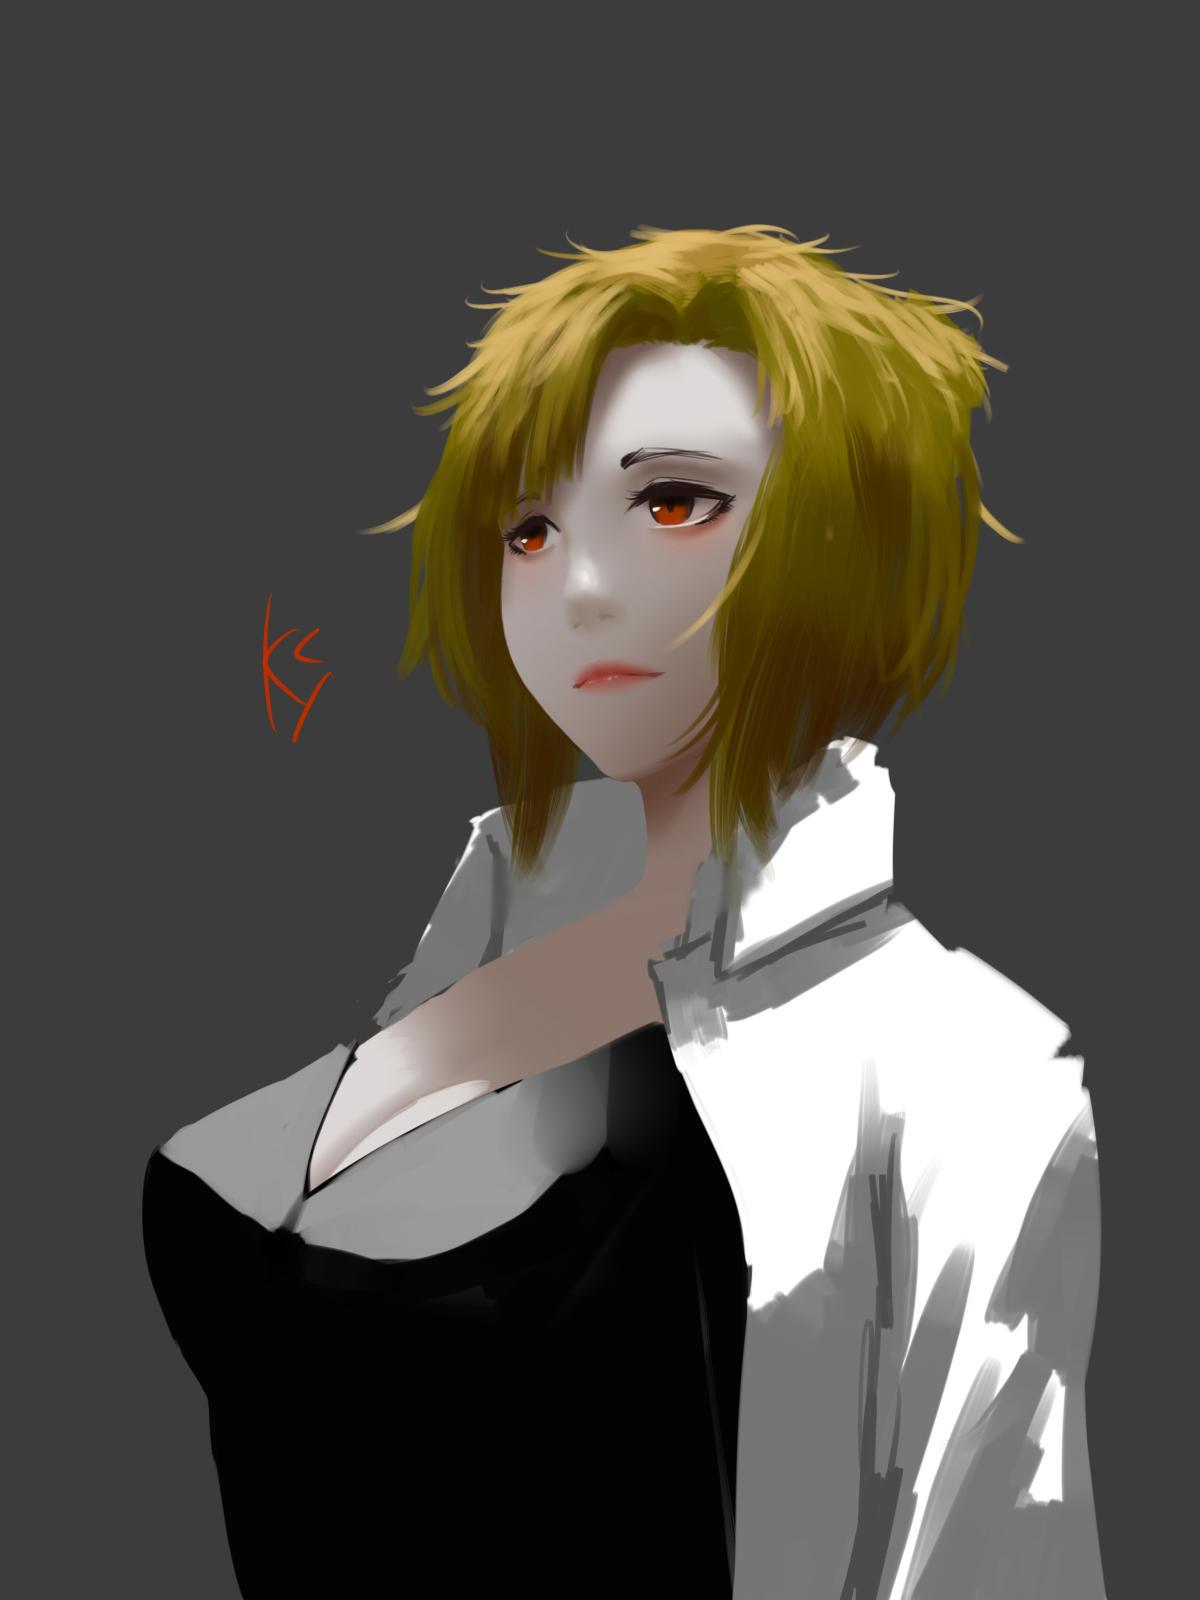 test by KatohHiki